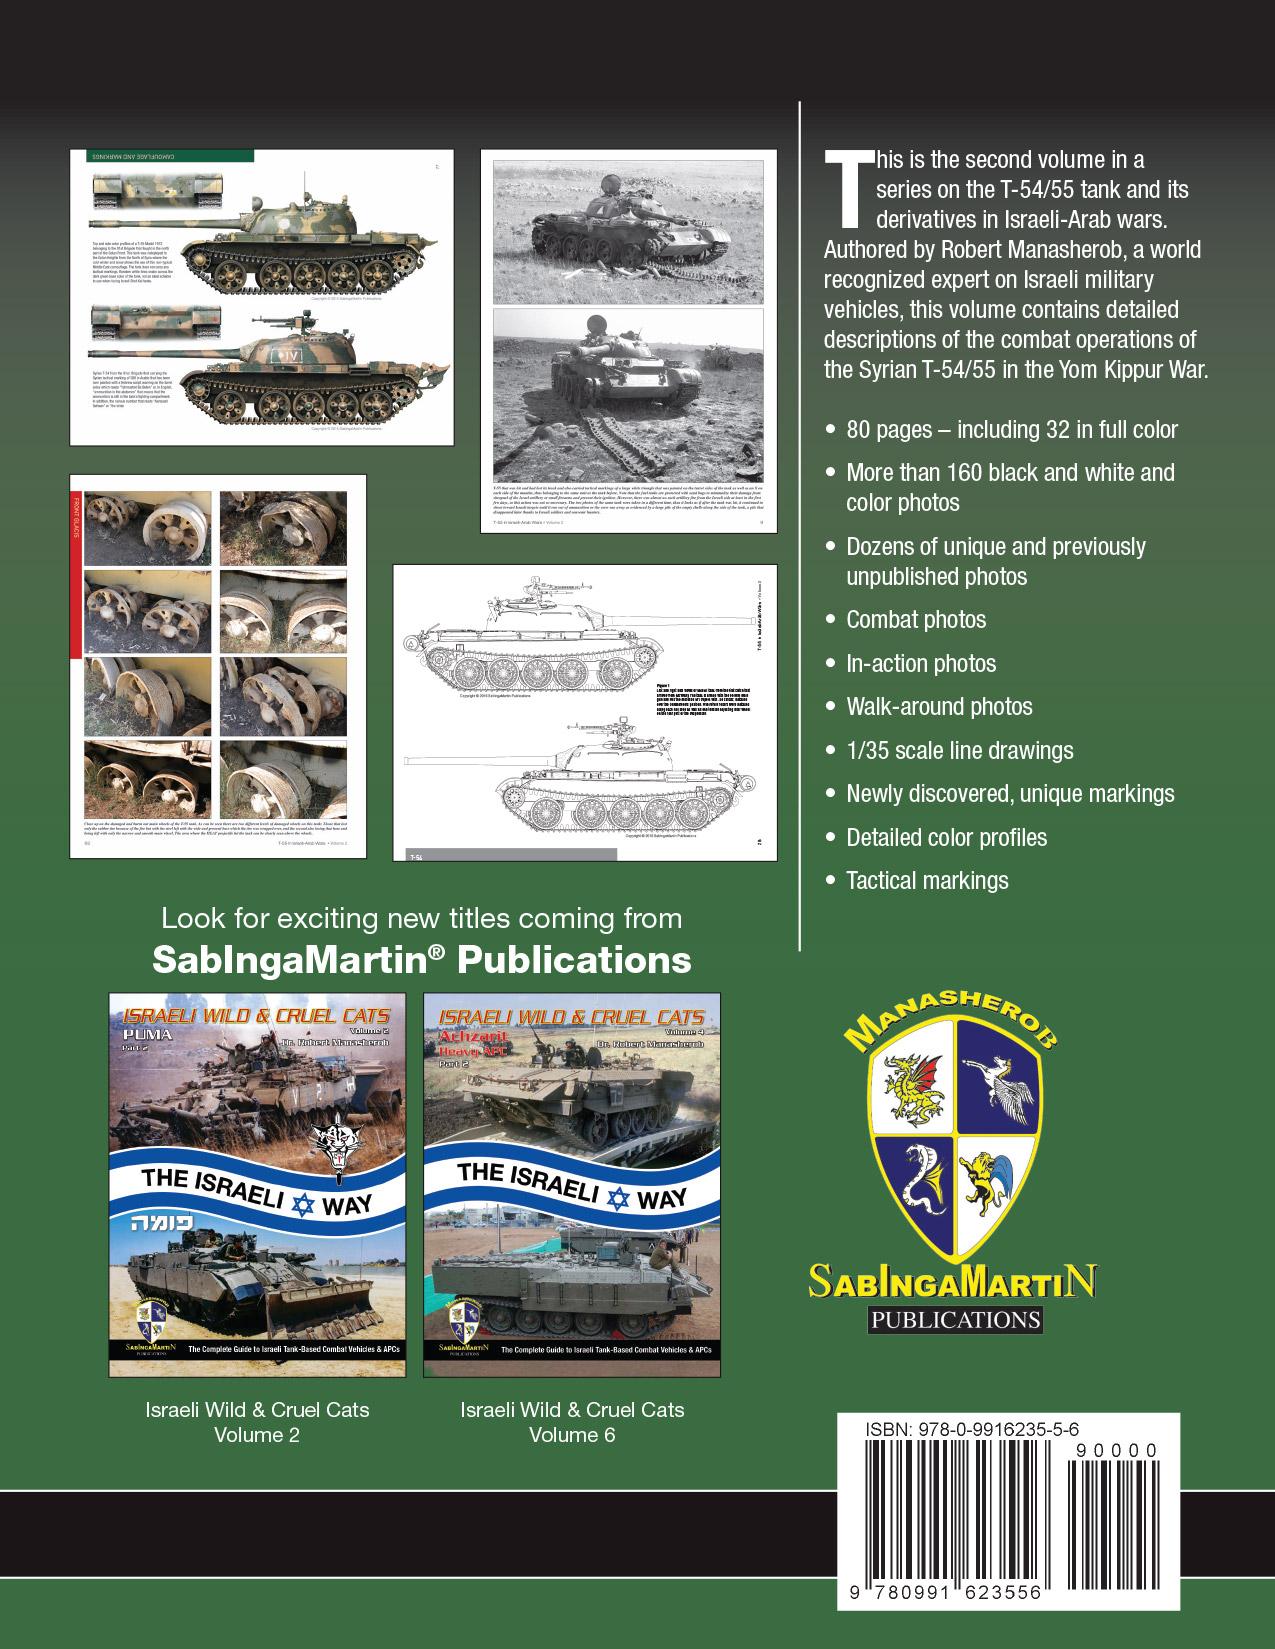 T-55-In-the-Arab-Israeli-Wars-Vol-2-Outside-Cover_02.jpg